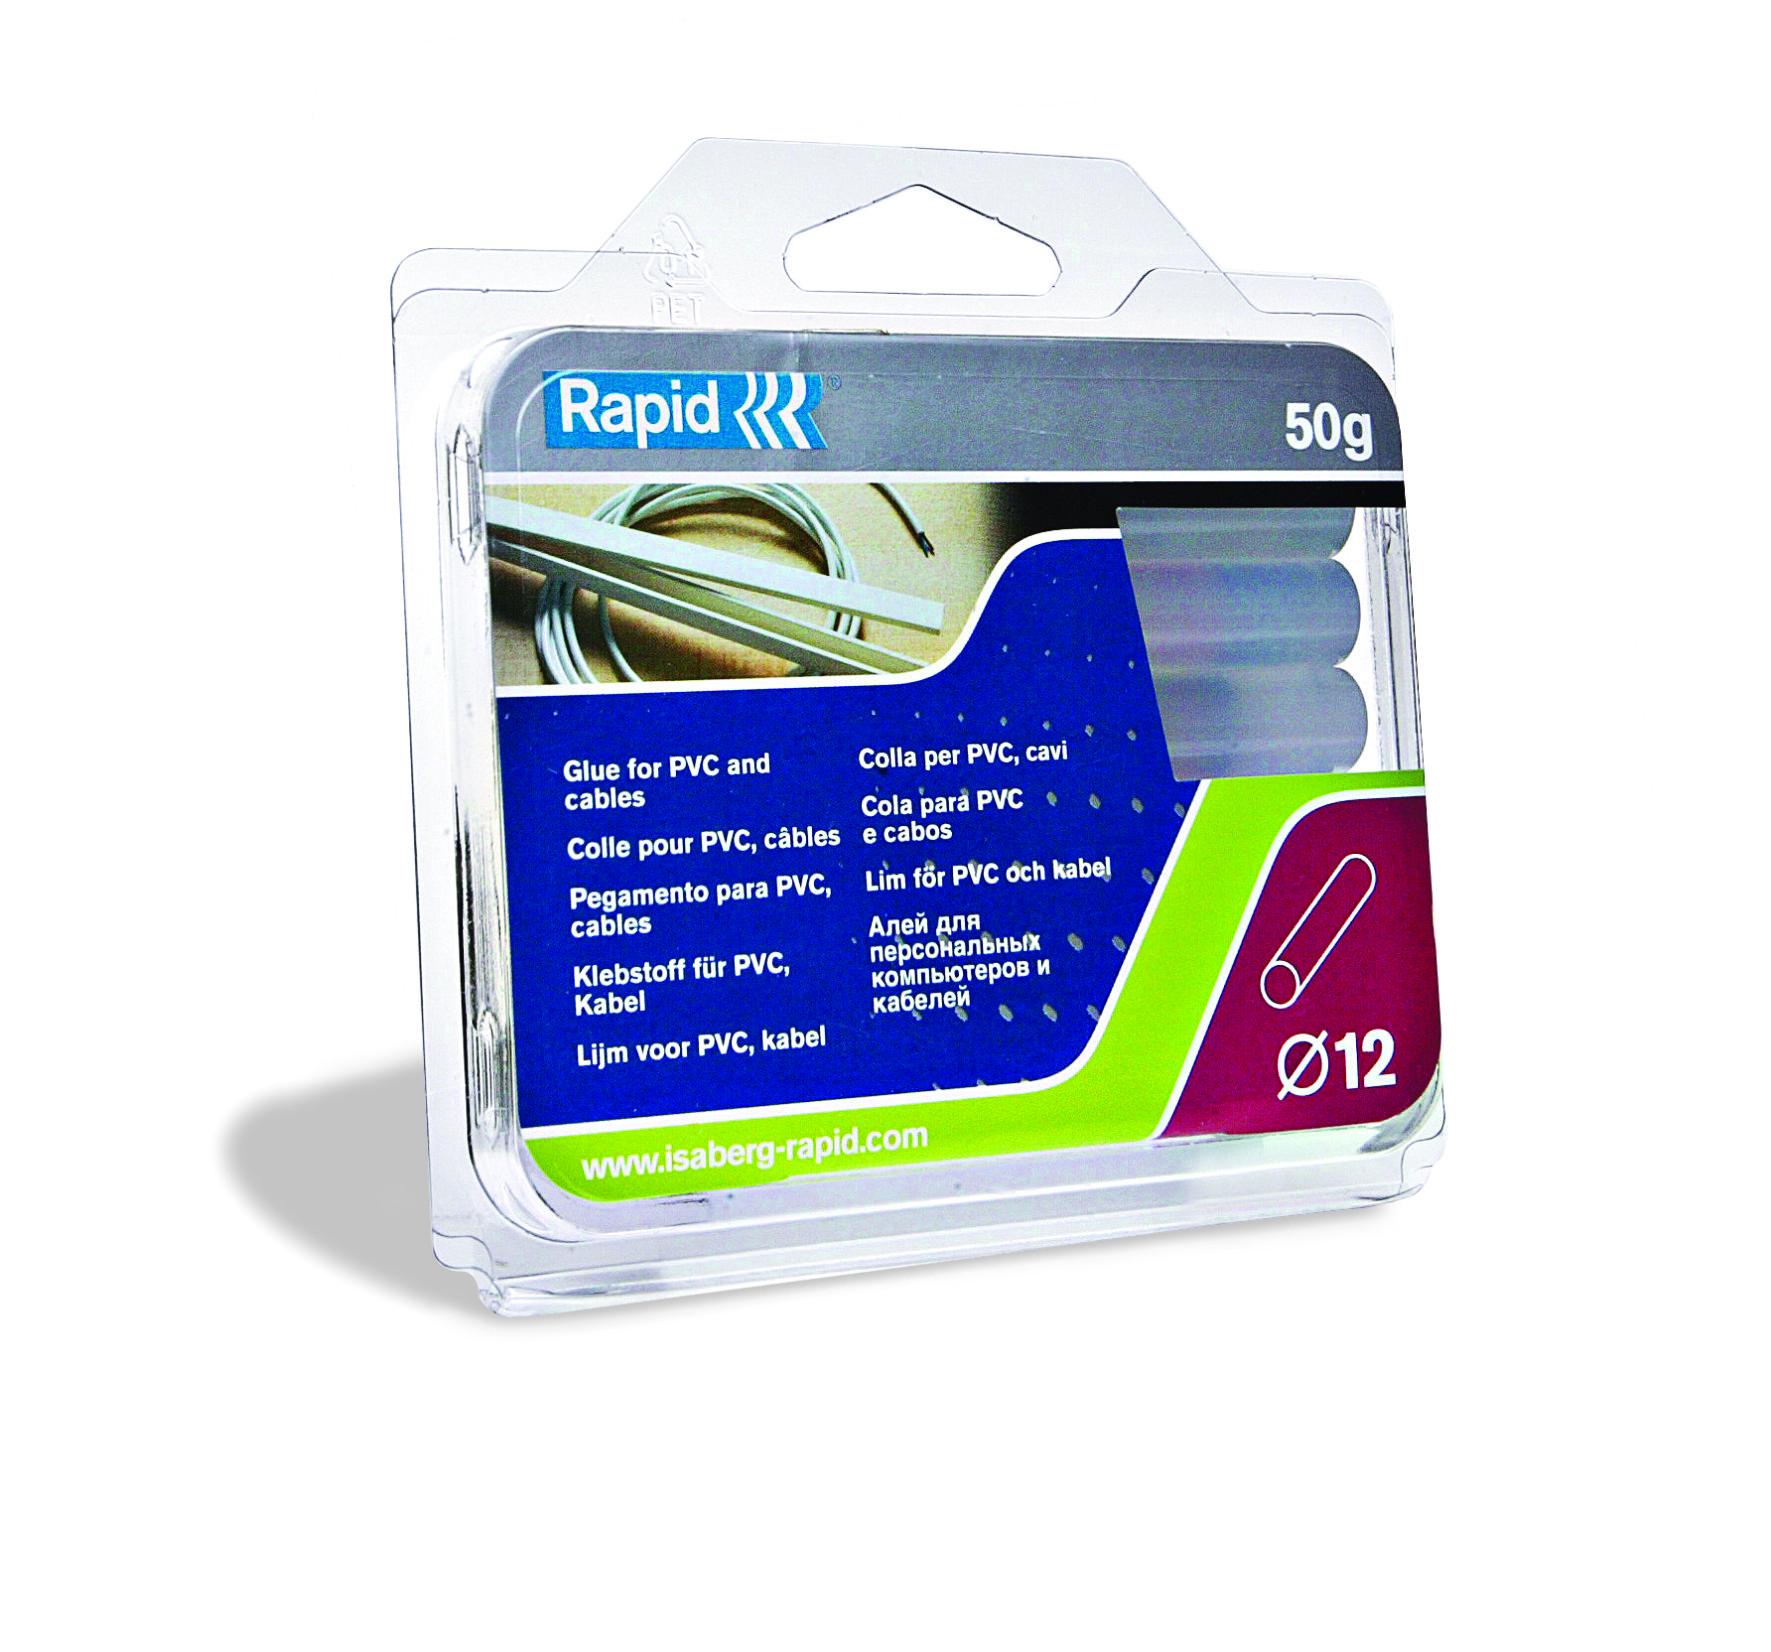 Rapid Lijmpatronen PVC Kabel Transparant Ø12mm 50g